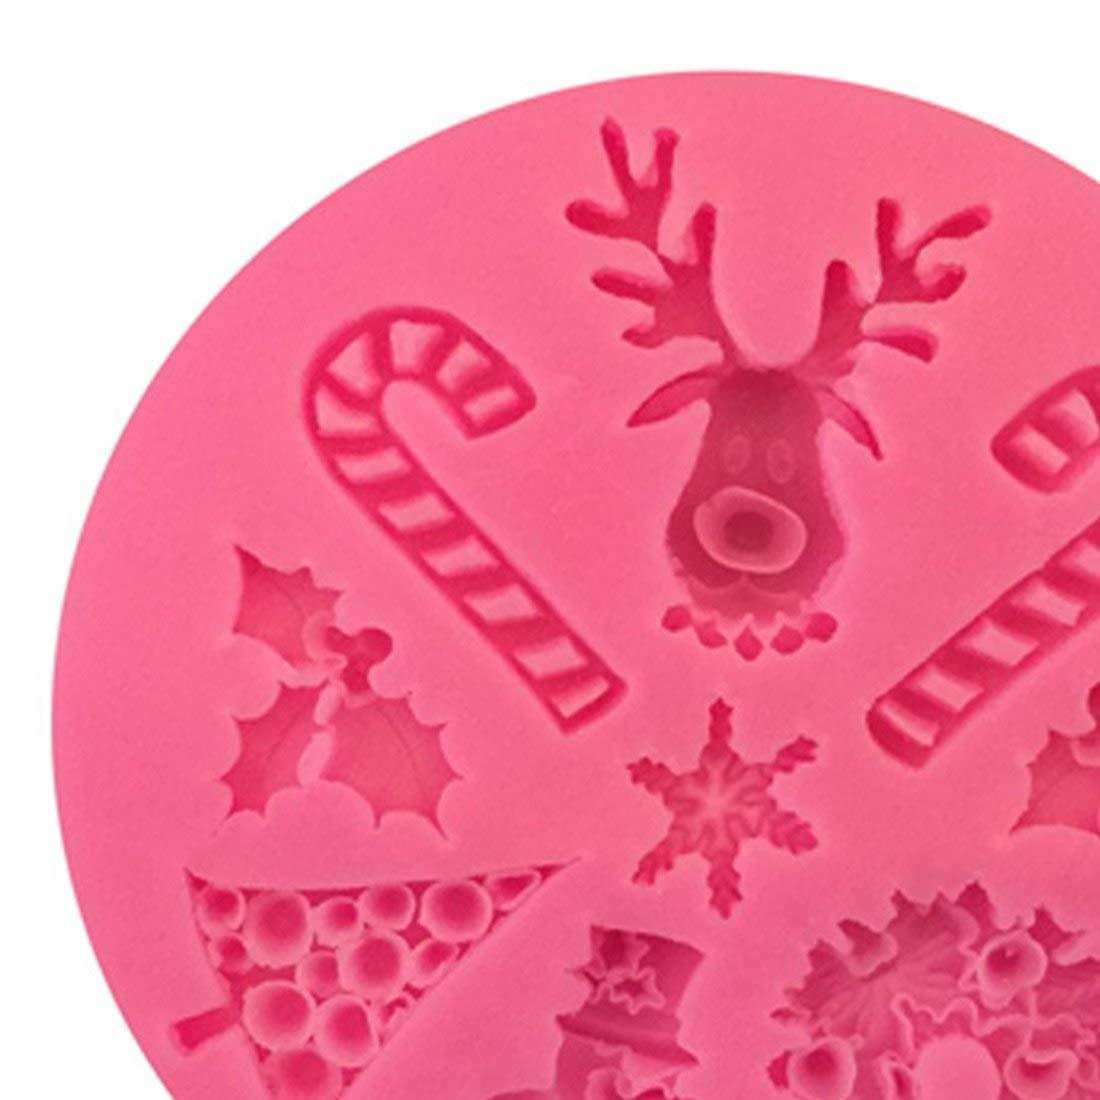 Amazon.com: Cake Molds - Christmas Elk Shaped Cake Mold Silicone Snow Fondant Sugar Craft Decorating Snowman - Numbers Cake Heart Circle Baby Shape Alphabet ...